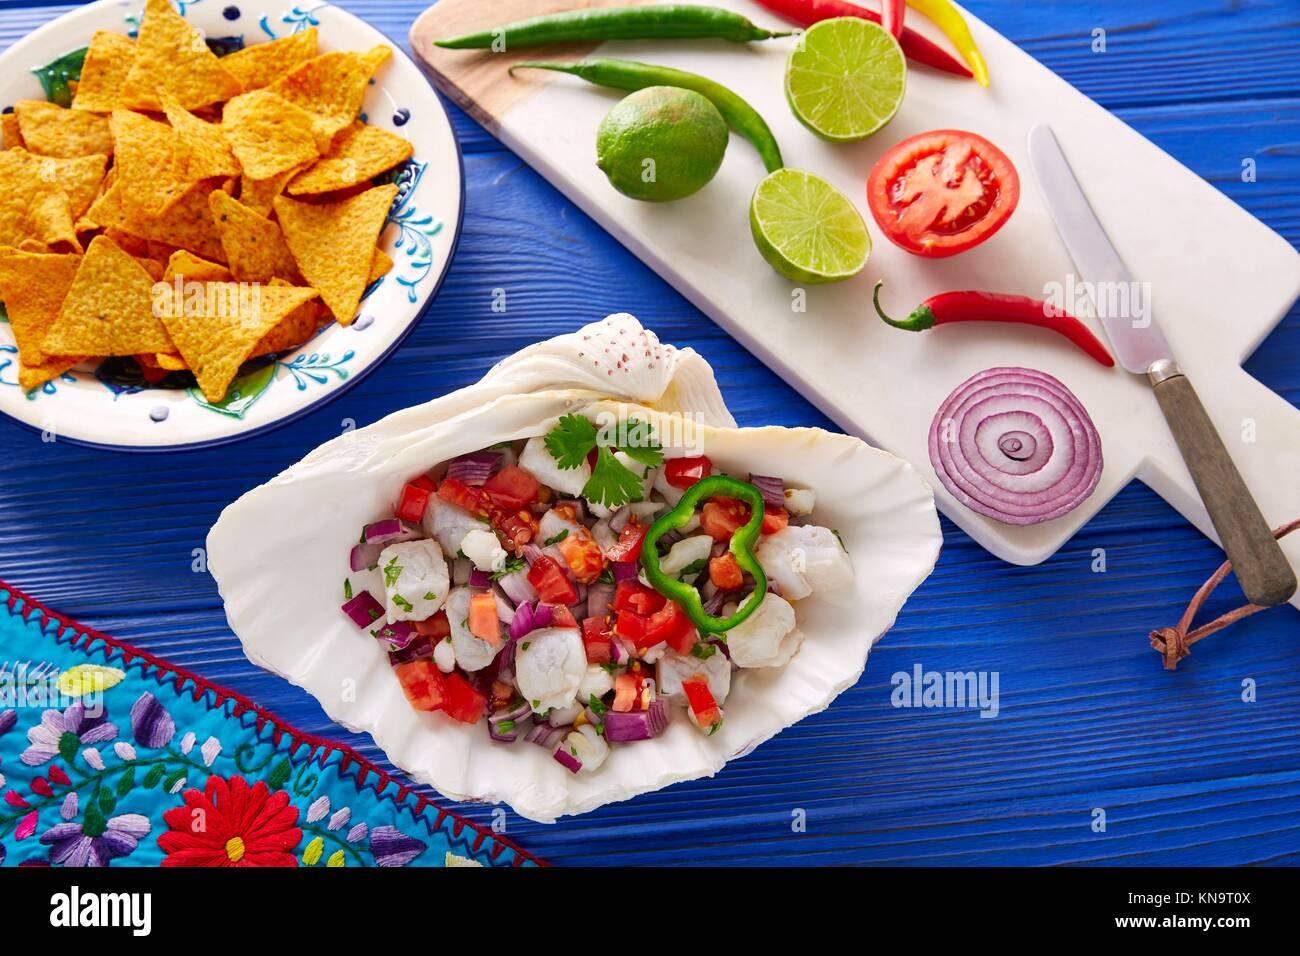 Chili Peppers Mexican Food Santana